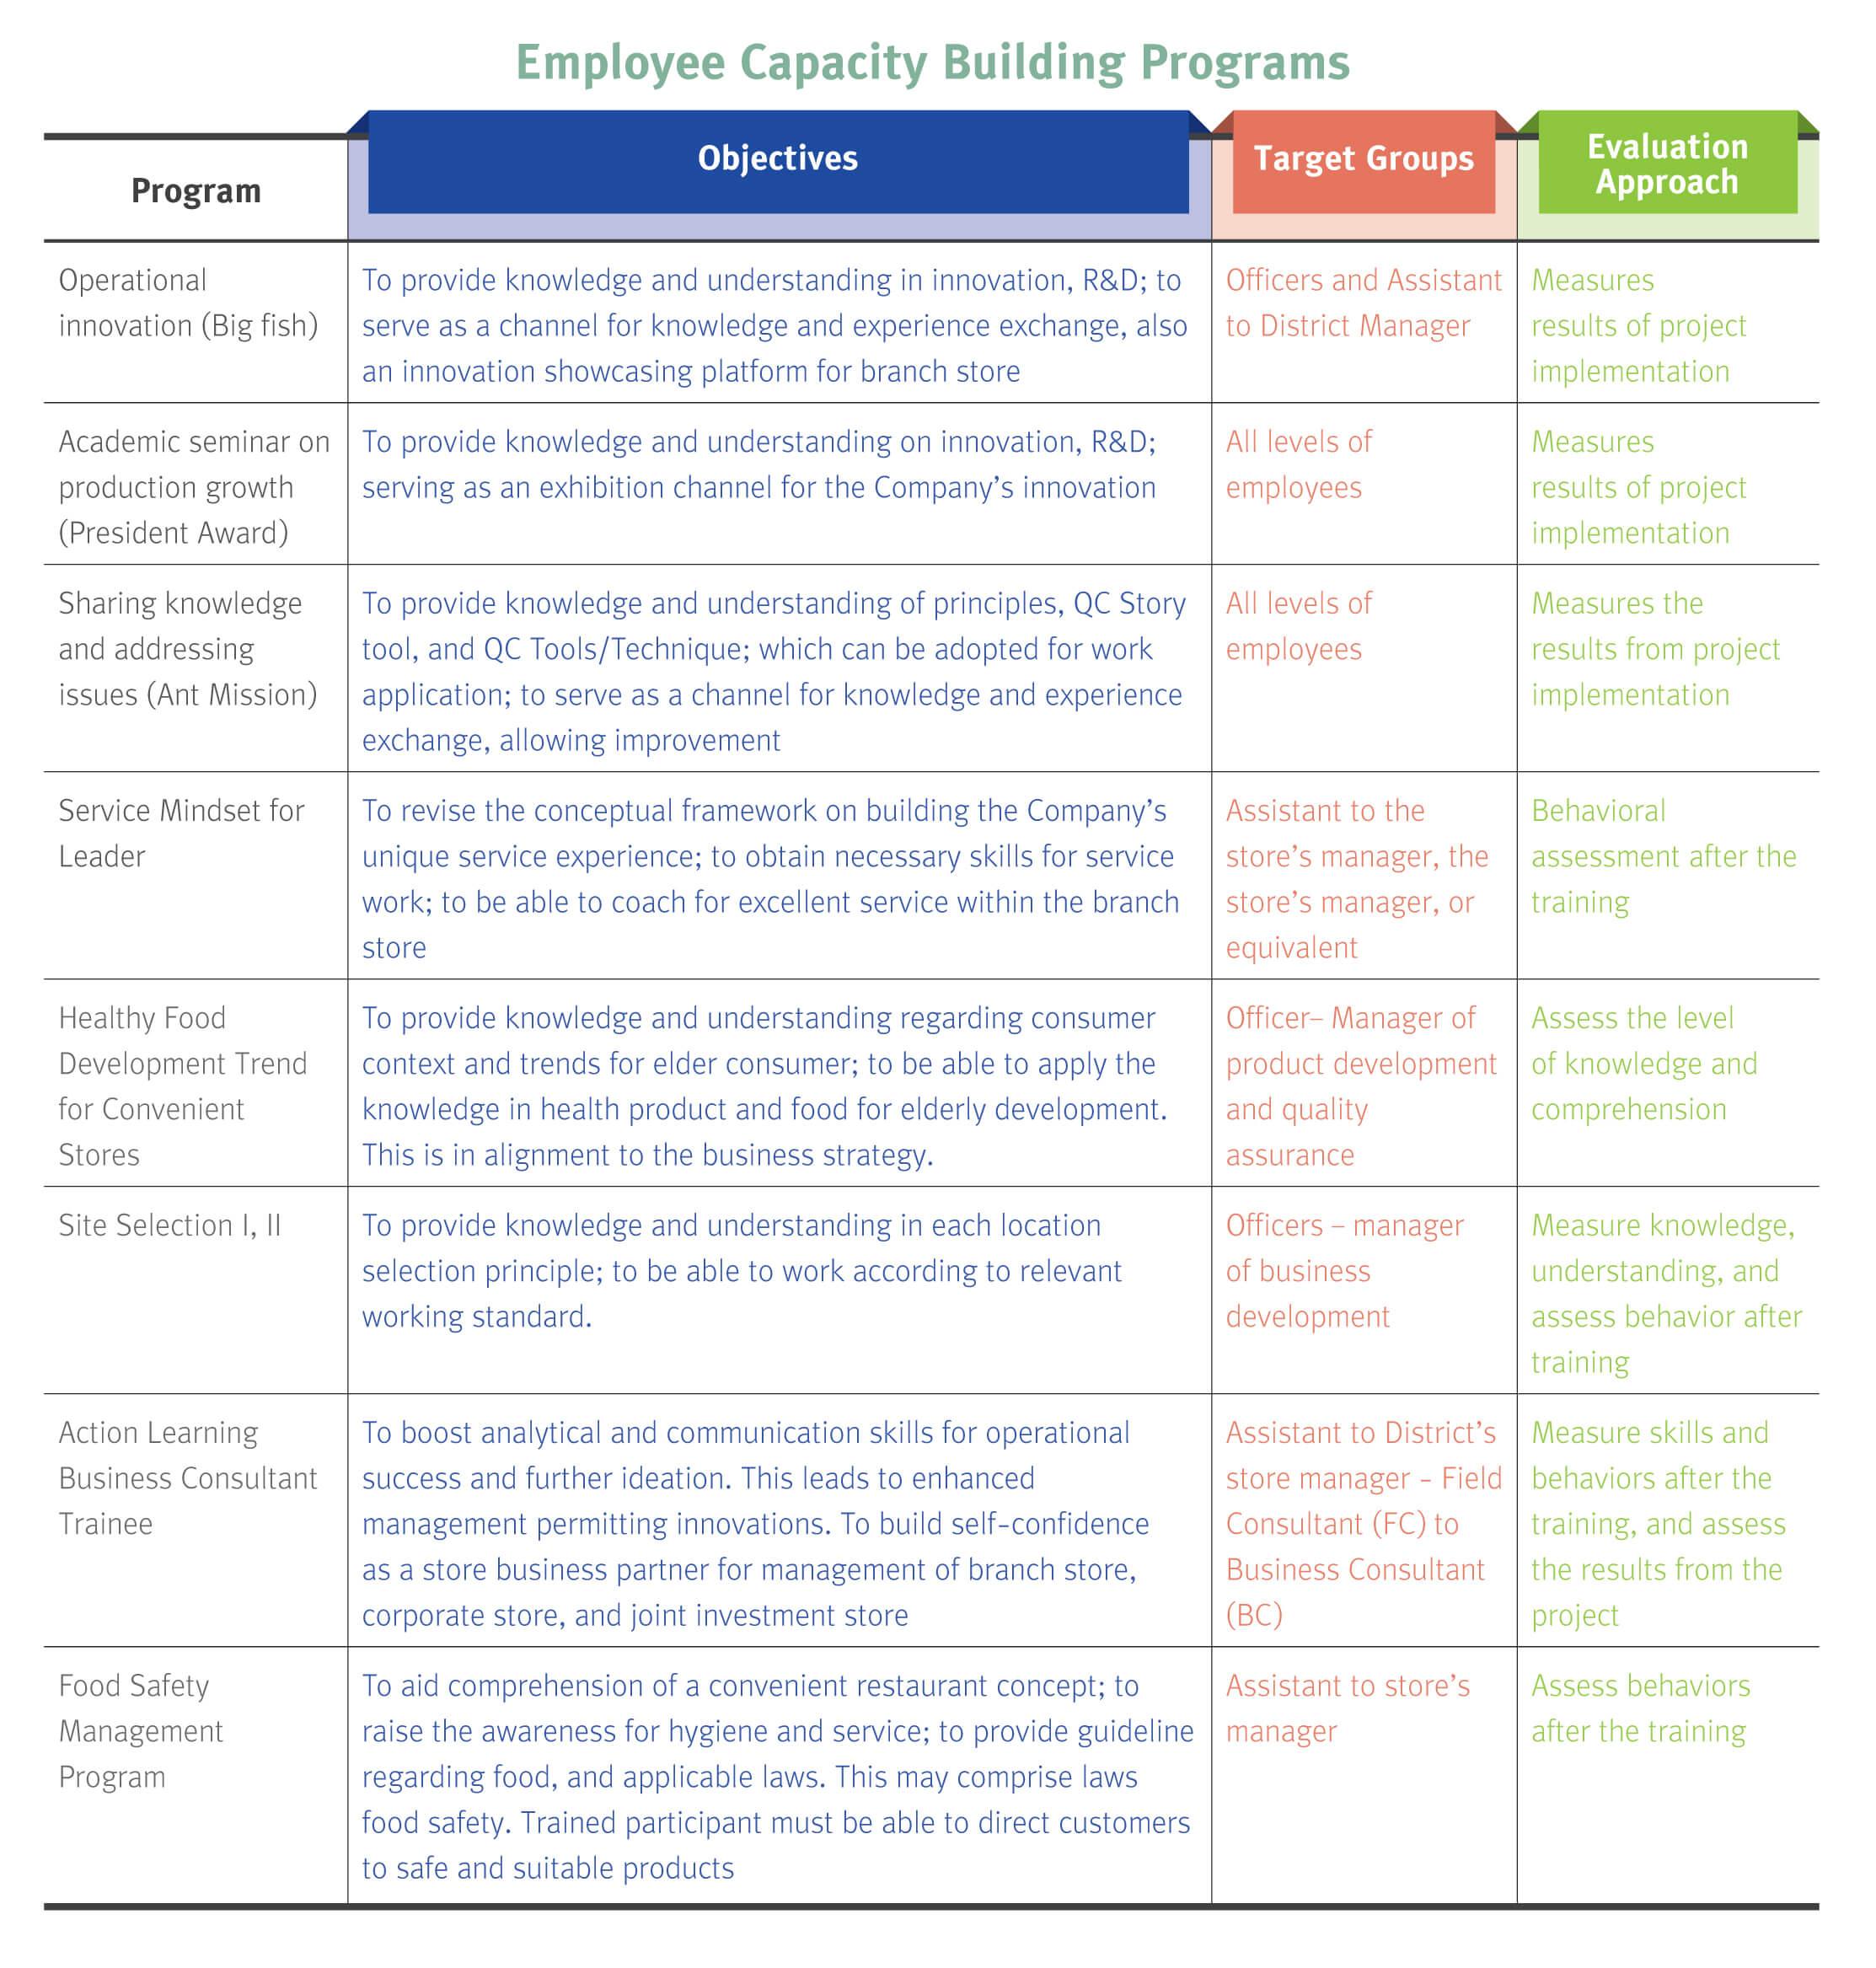 Leadership and Human Capital Development - CPALL